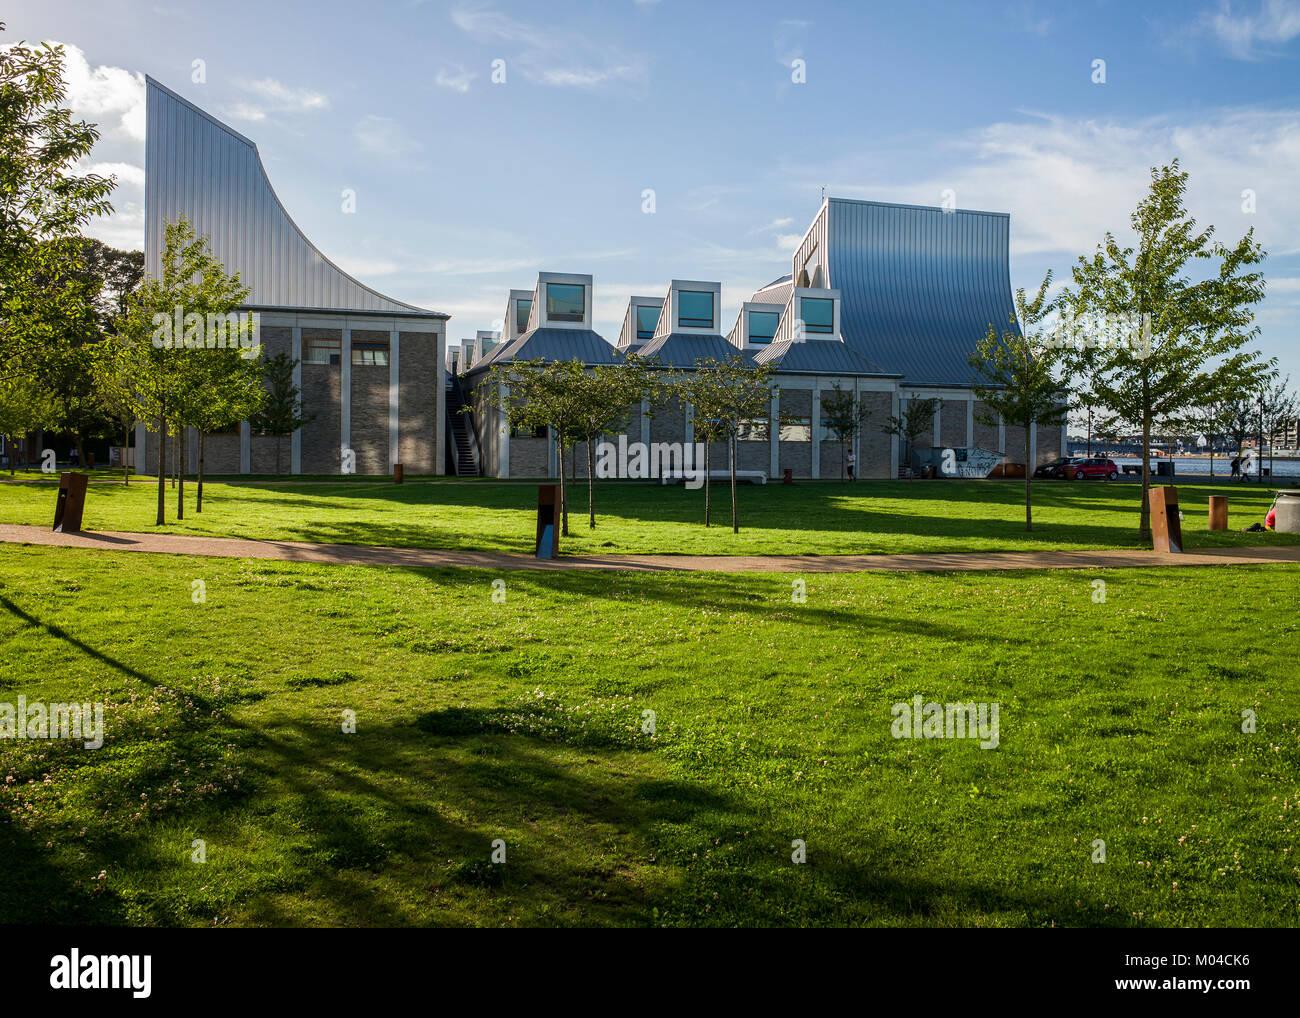 The Utzon Center Aalborg Denmark architecture - Stock Image